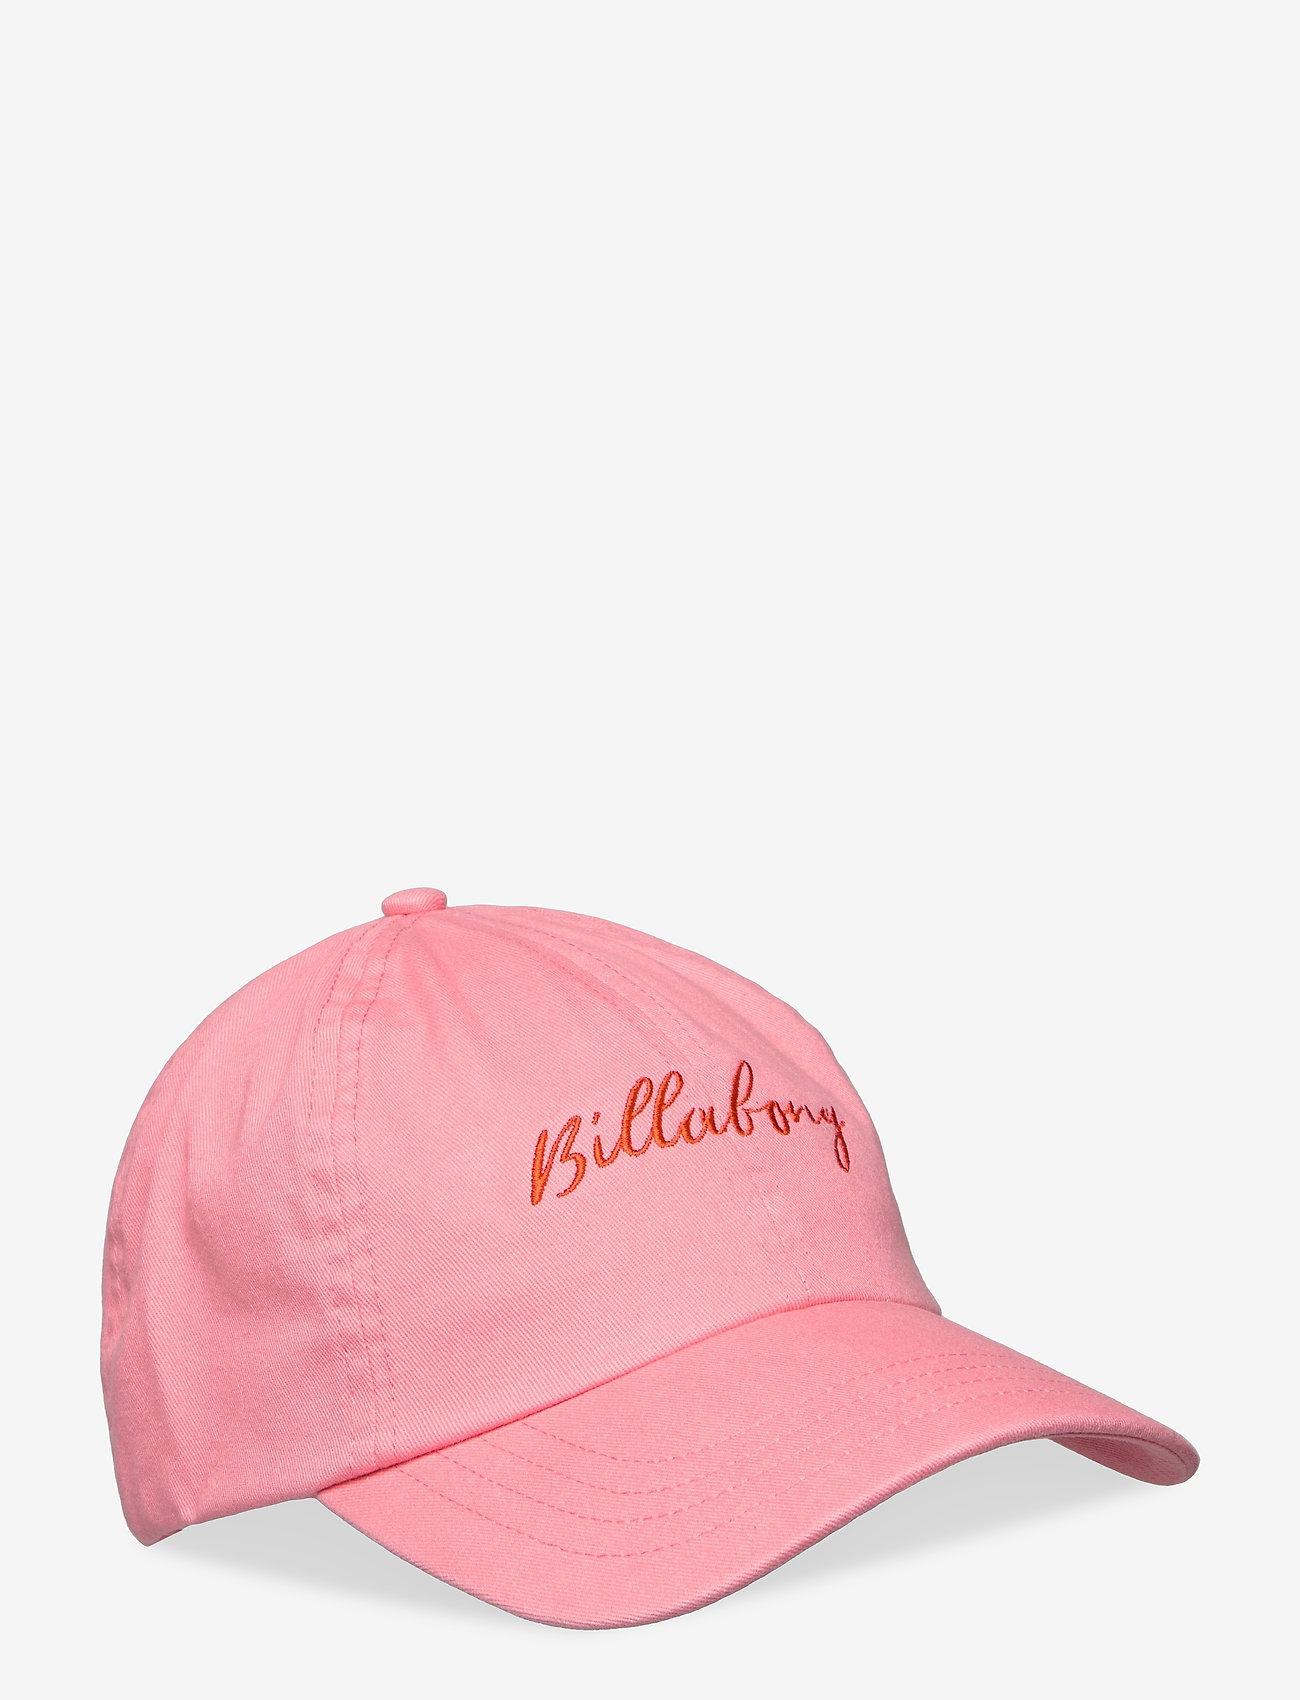 Billabong - ESSENTIAL CAP - kasketter - gypsy pink - 0